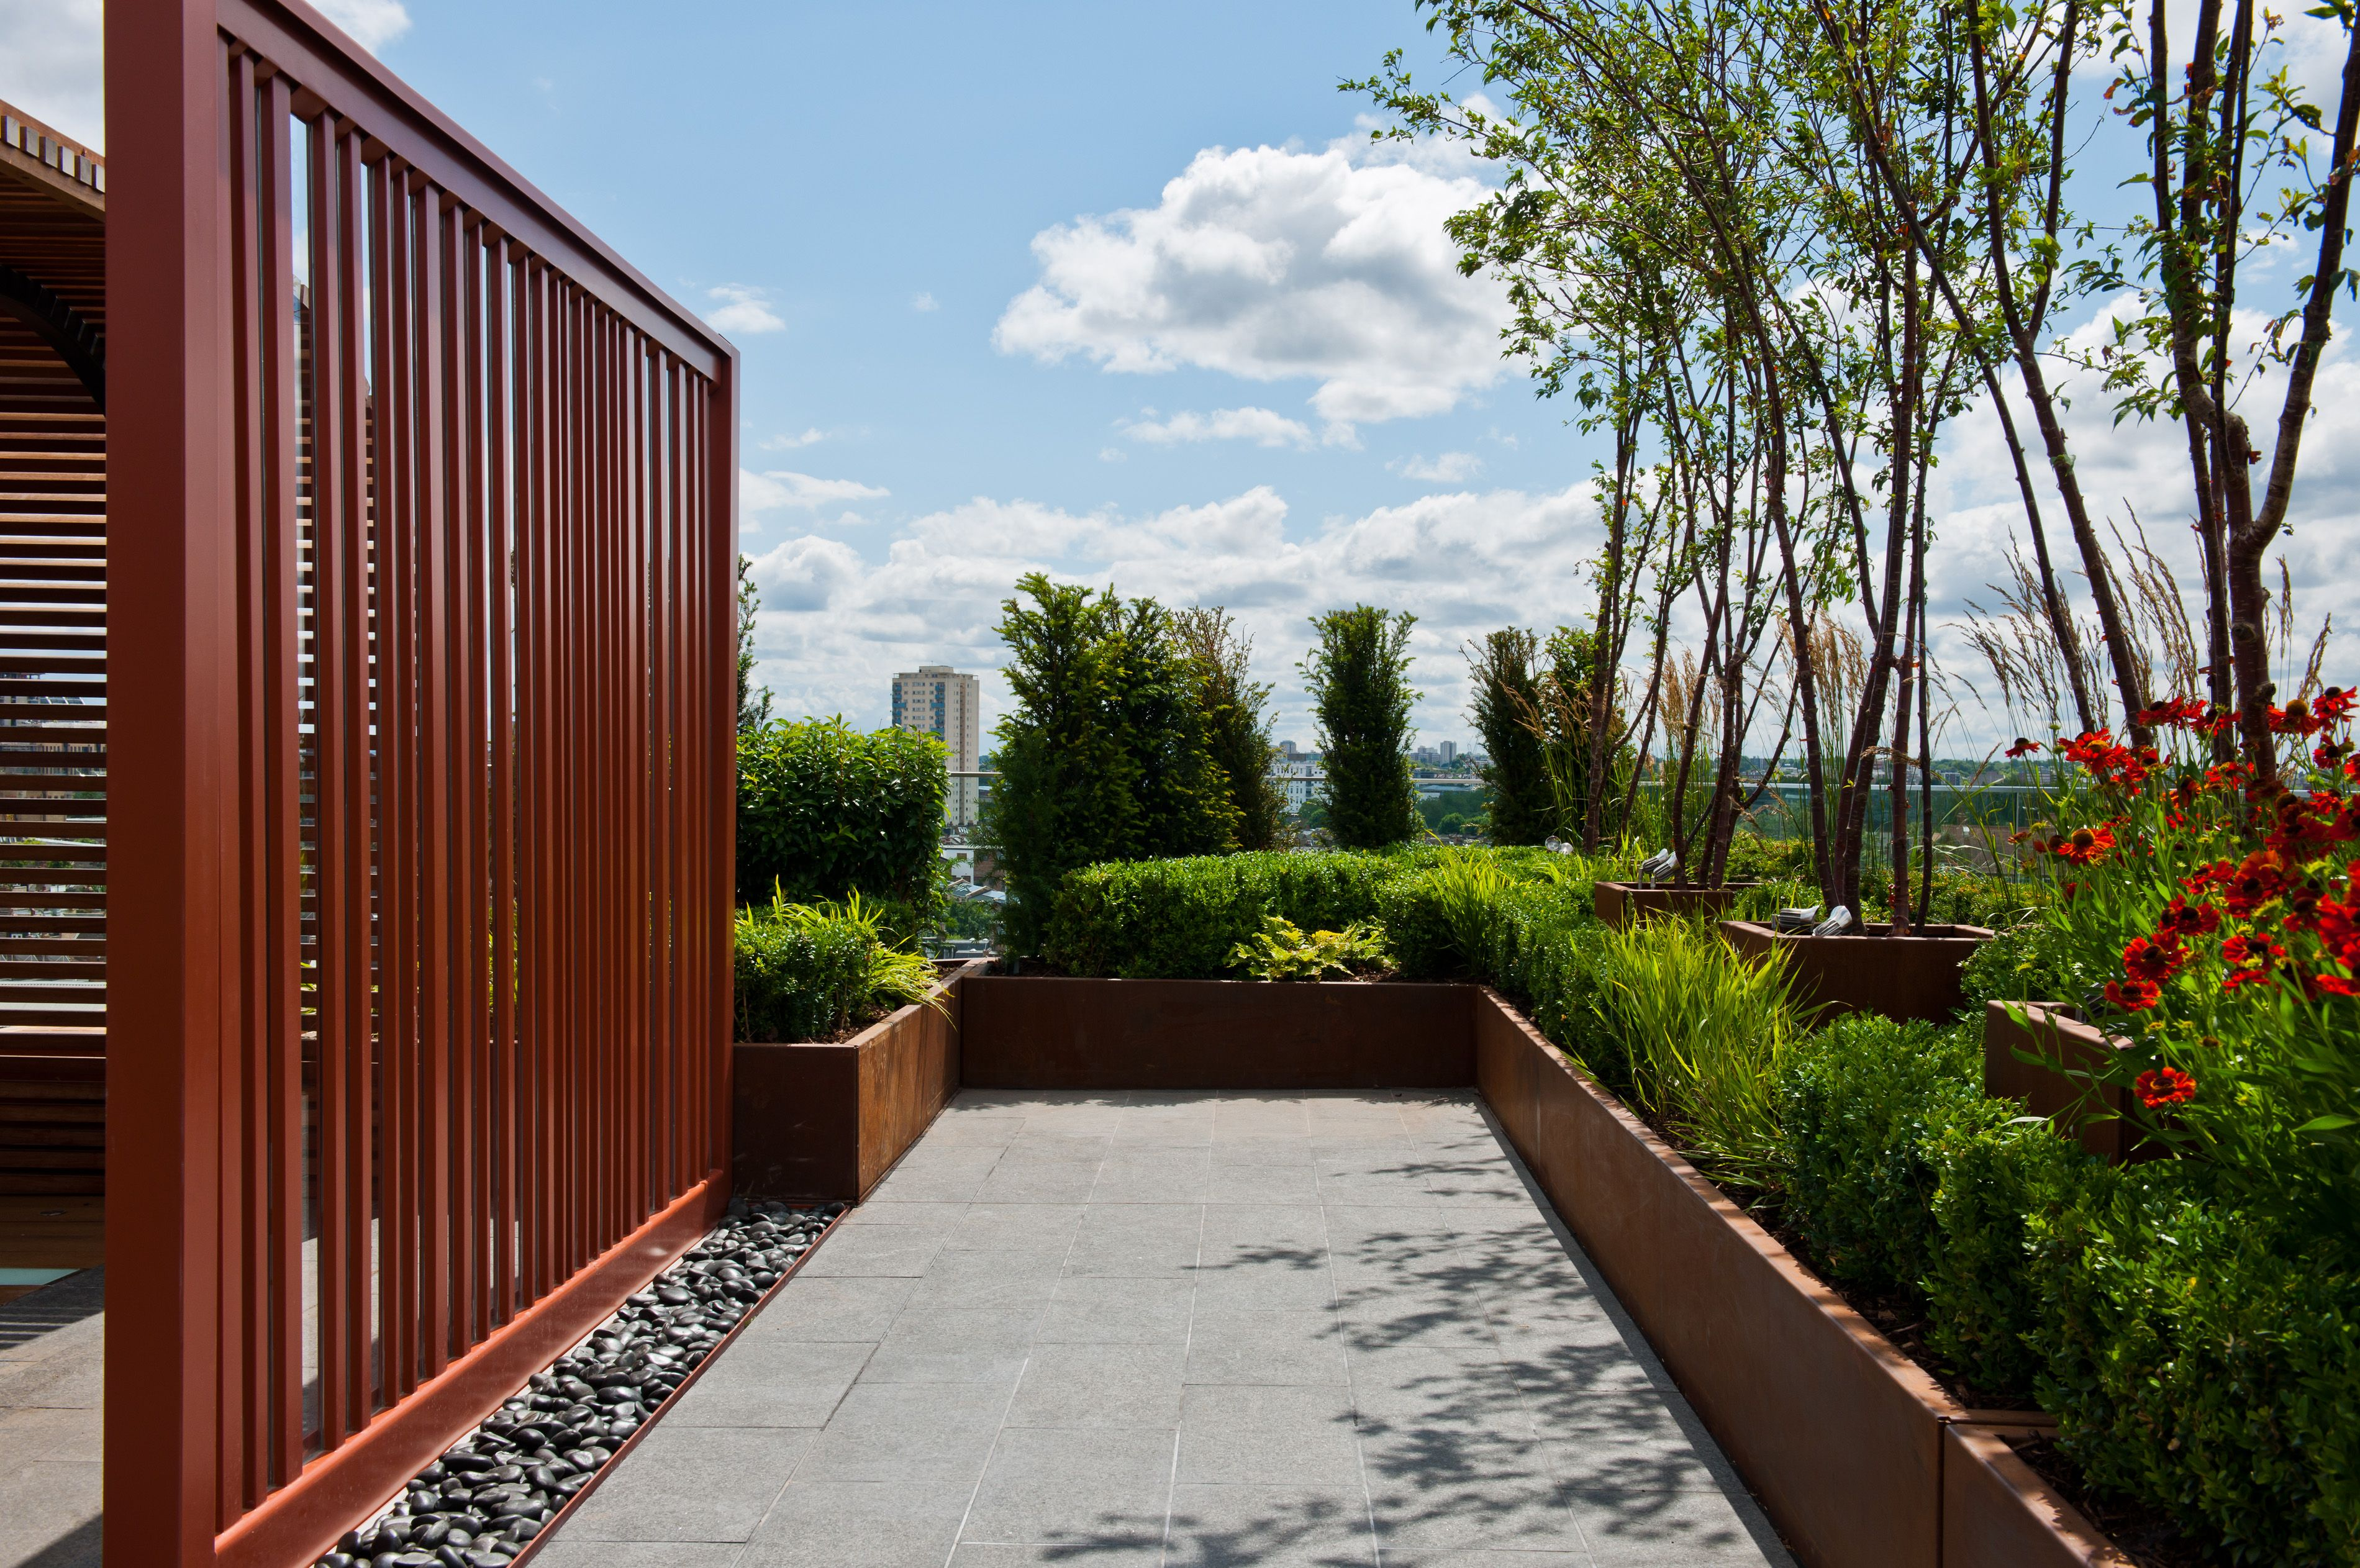 dockside house chelsea creek rooftop garden by aralia garden